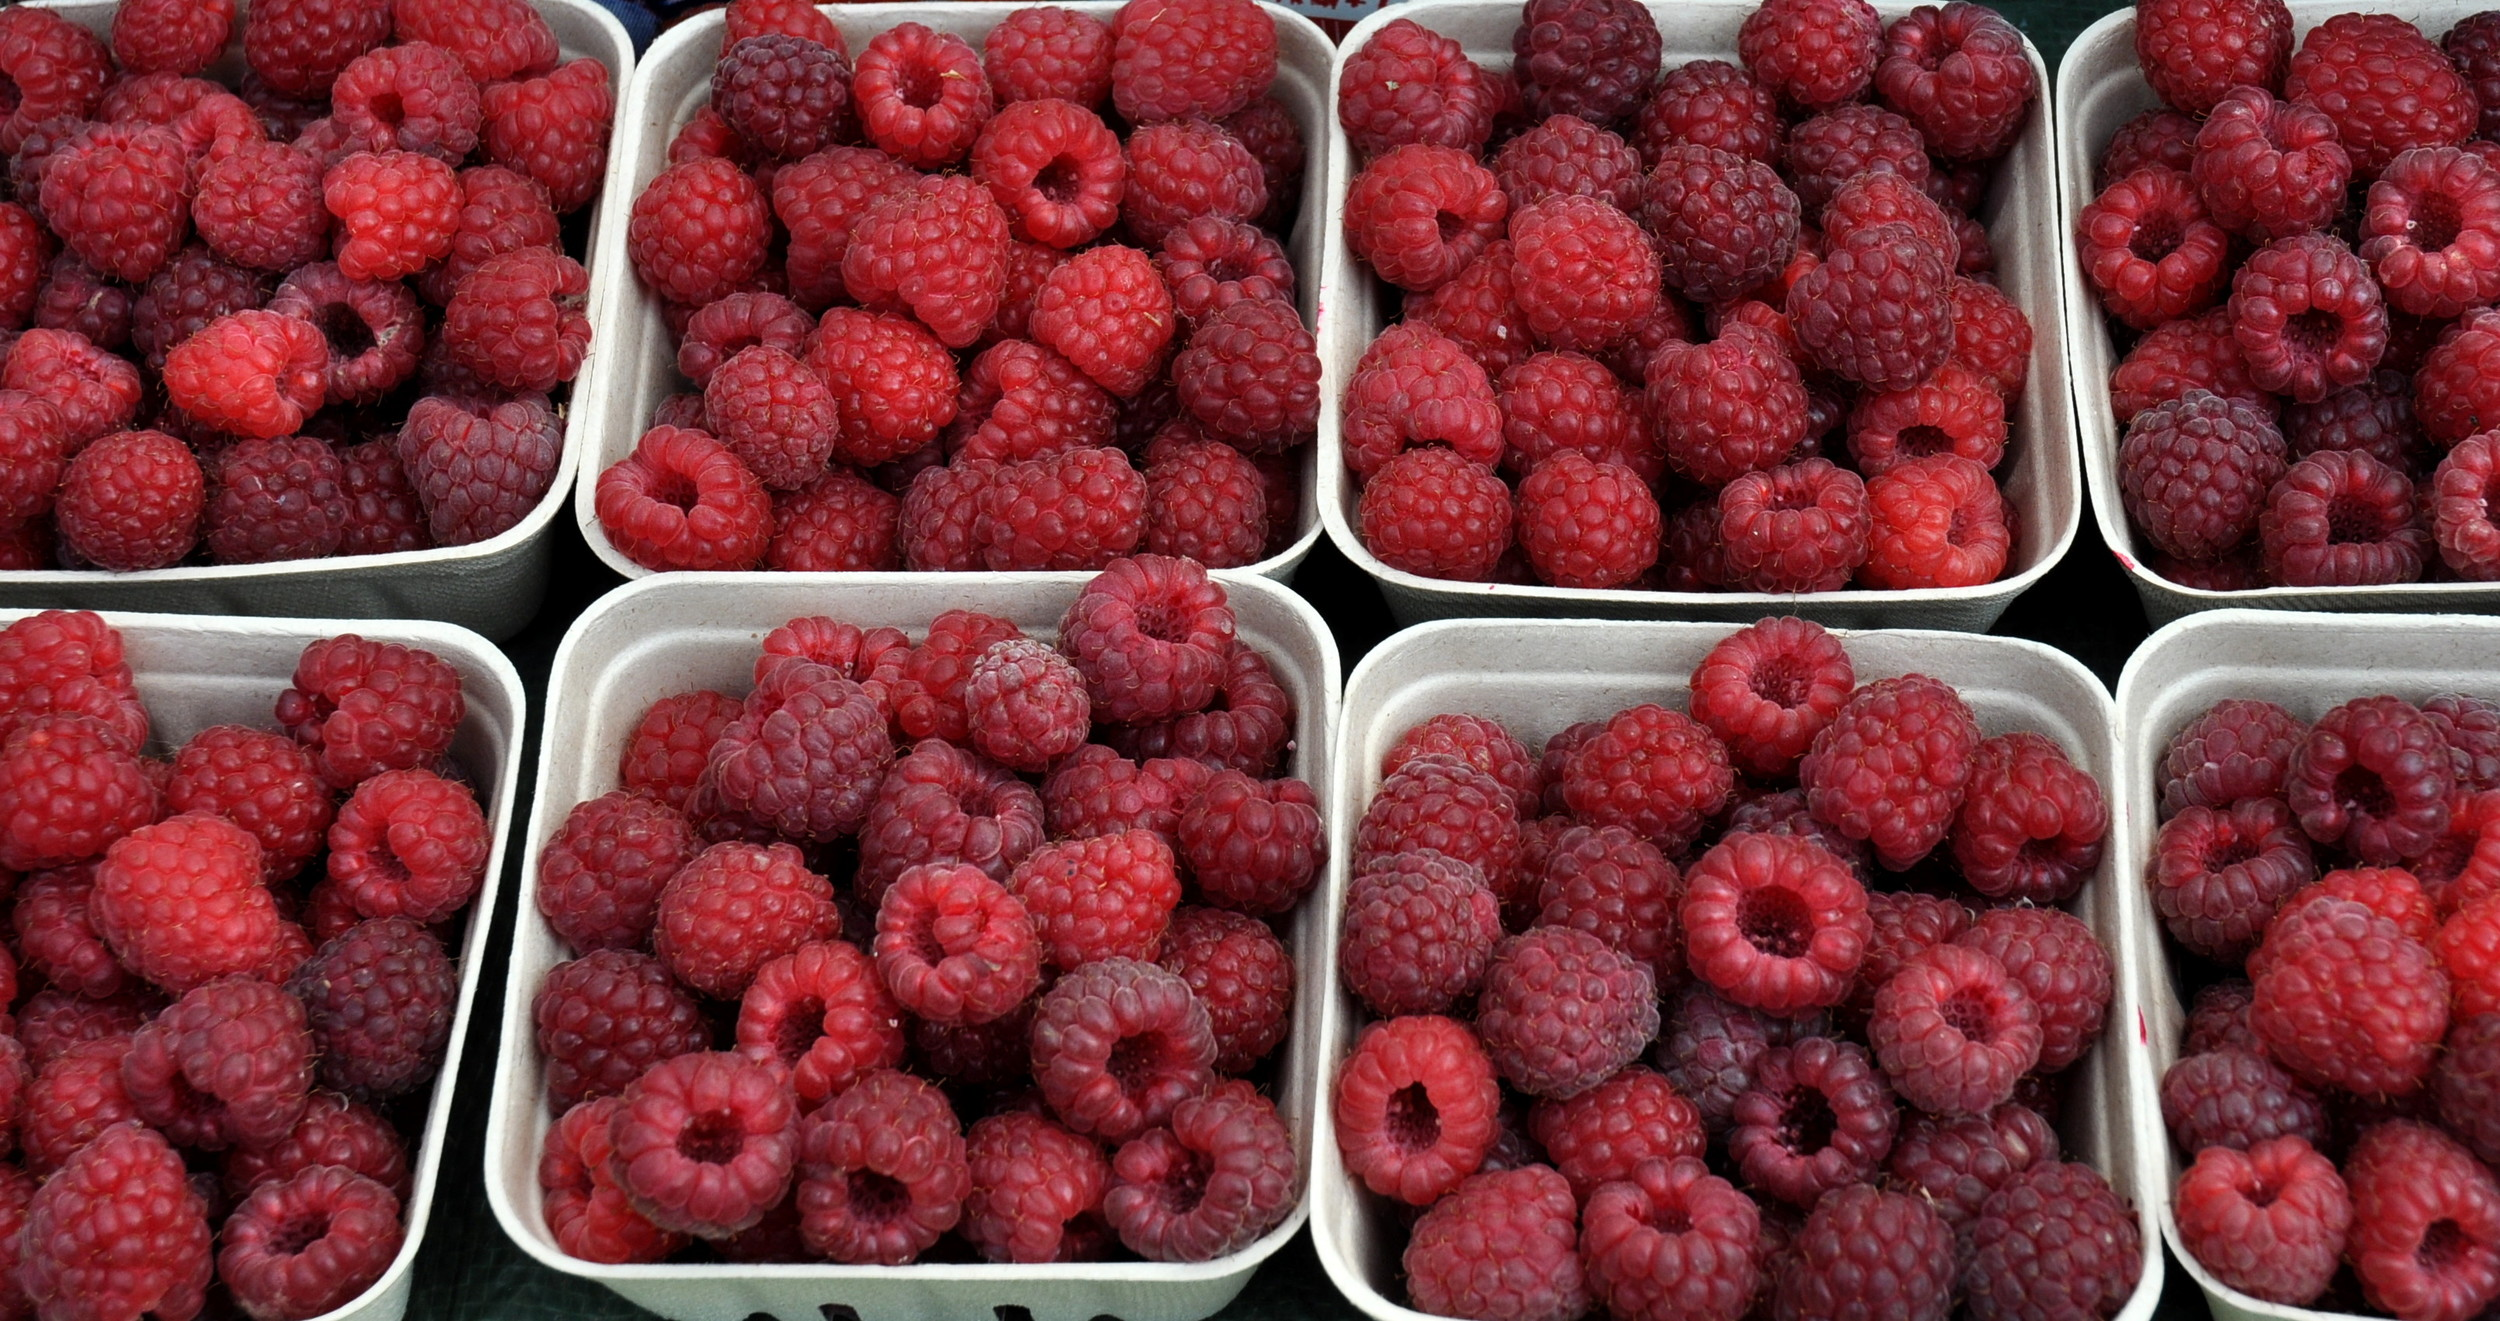 Organic raspberries from Gaia's Harmony Farm. Photo copyright 2014 by Zachary D. Lyons.